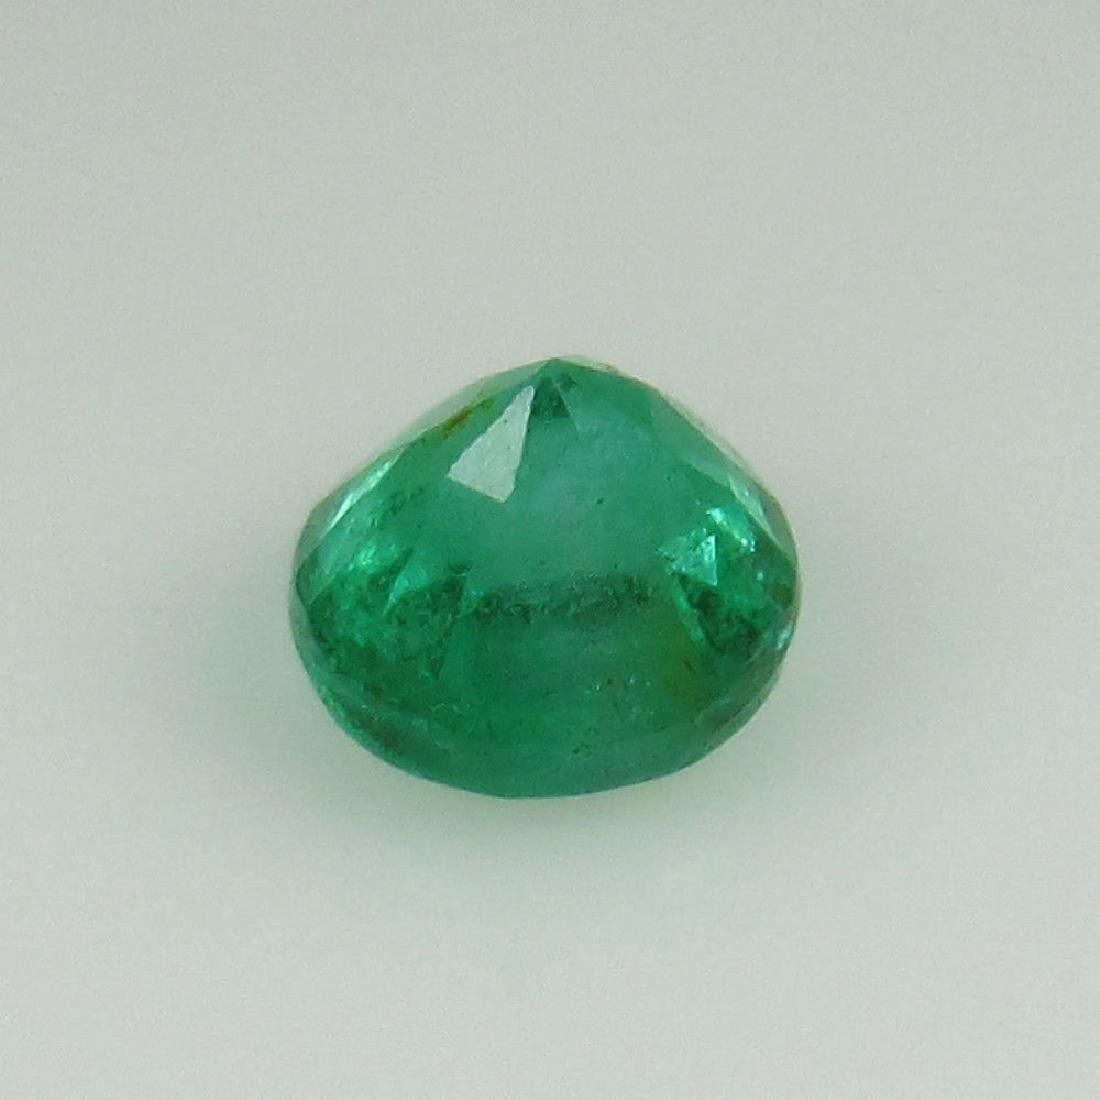 0.40 Ct Genuine Zambian Emerald 4.5 mm Round Cut - 2